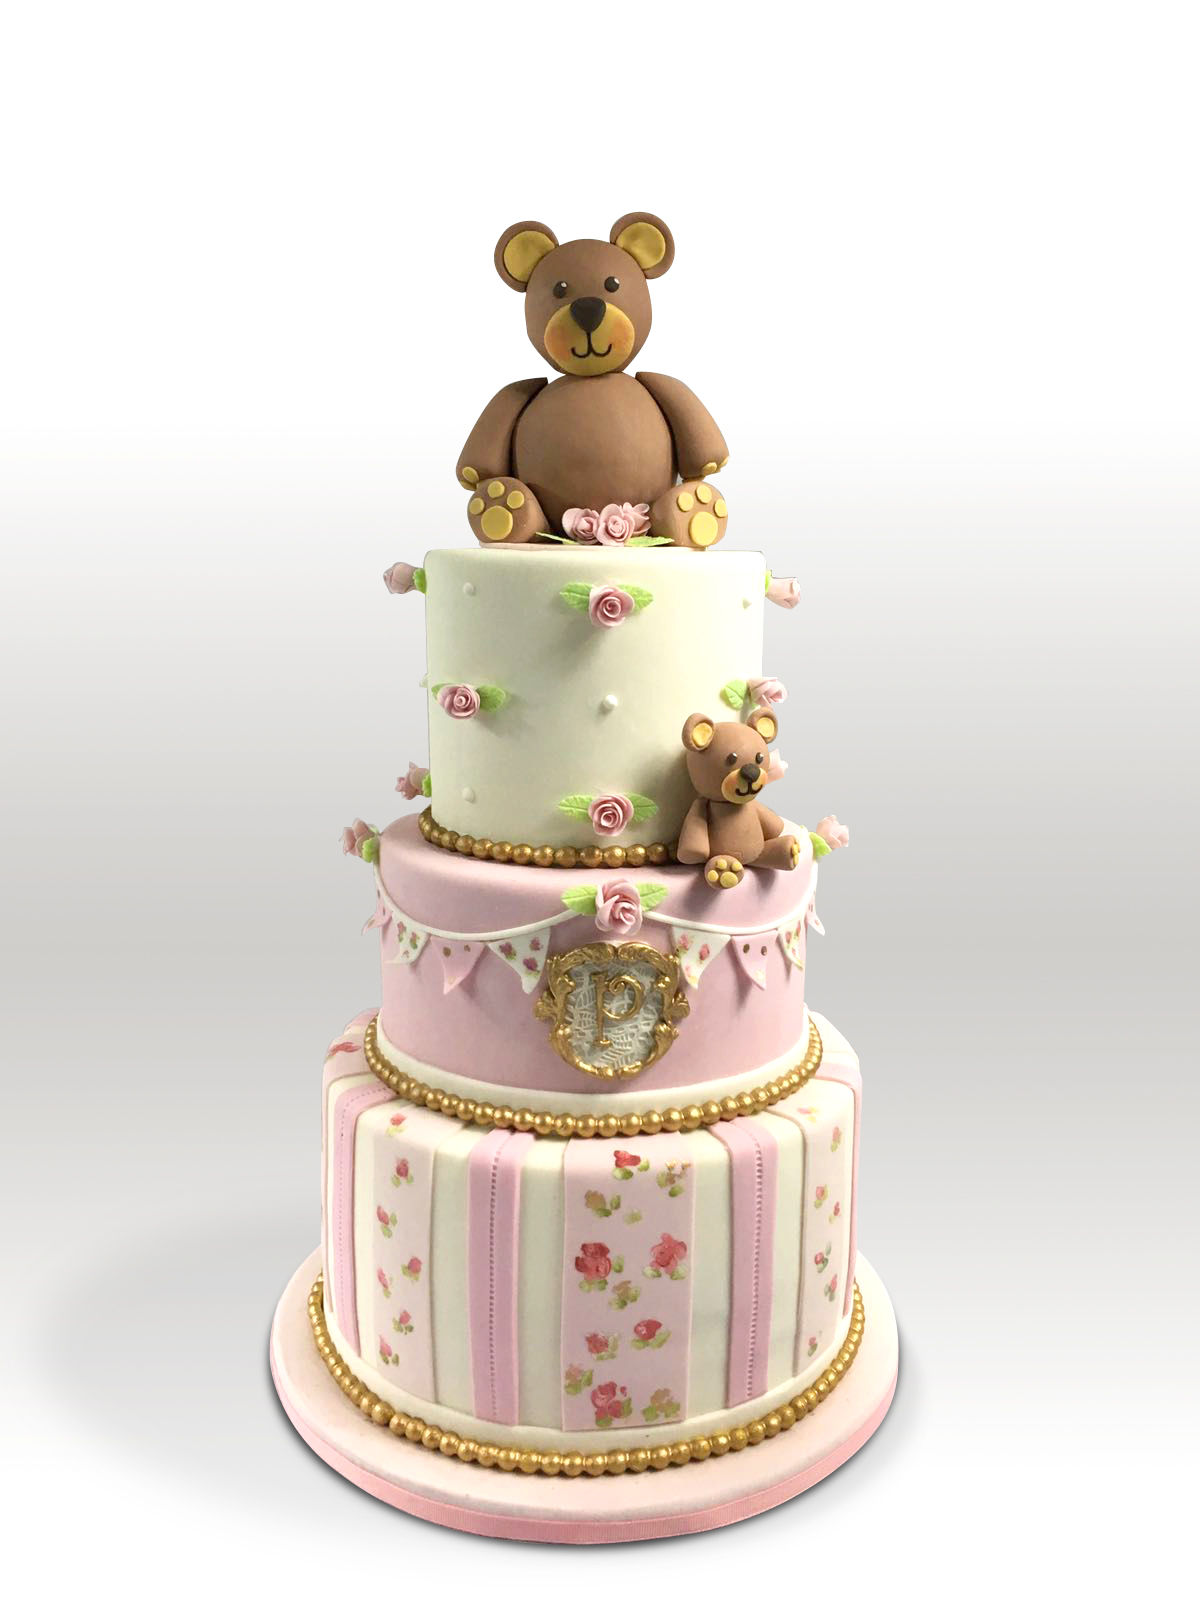 Pink & White Teddy Bear Cake